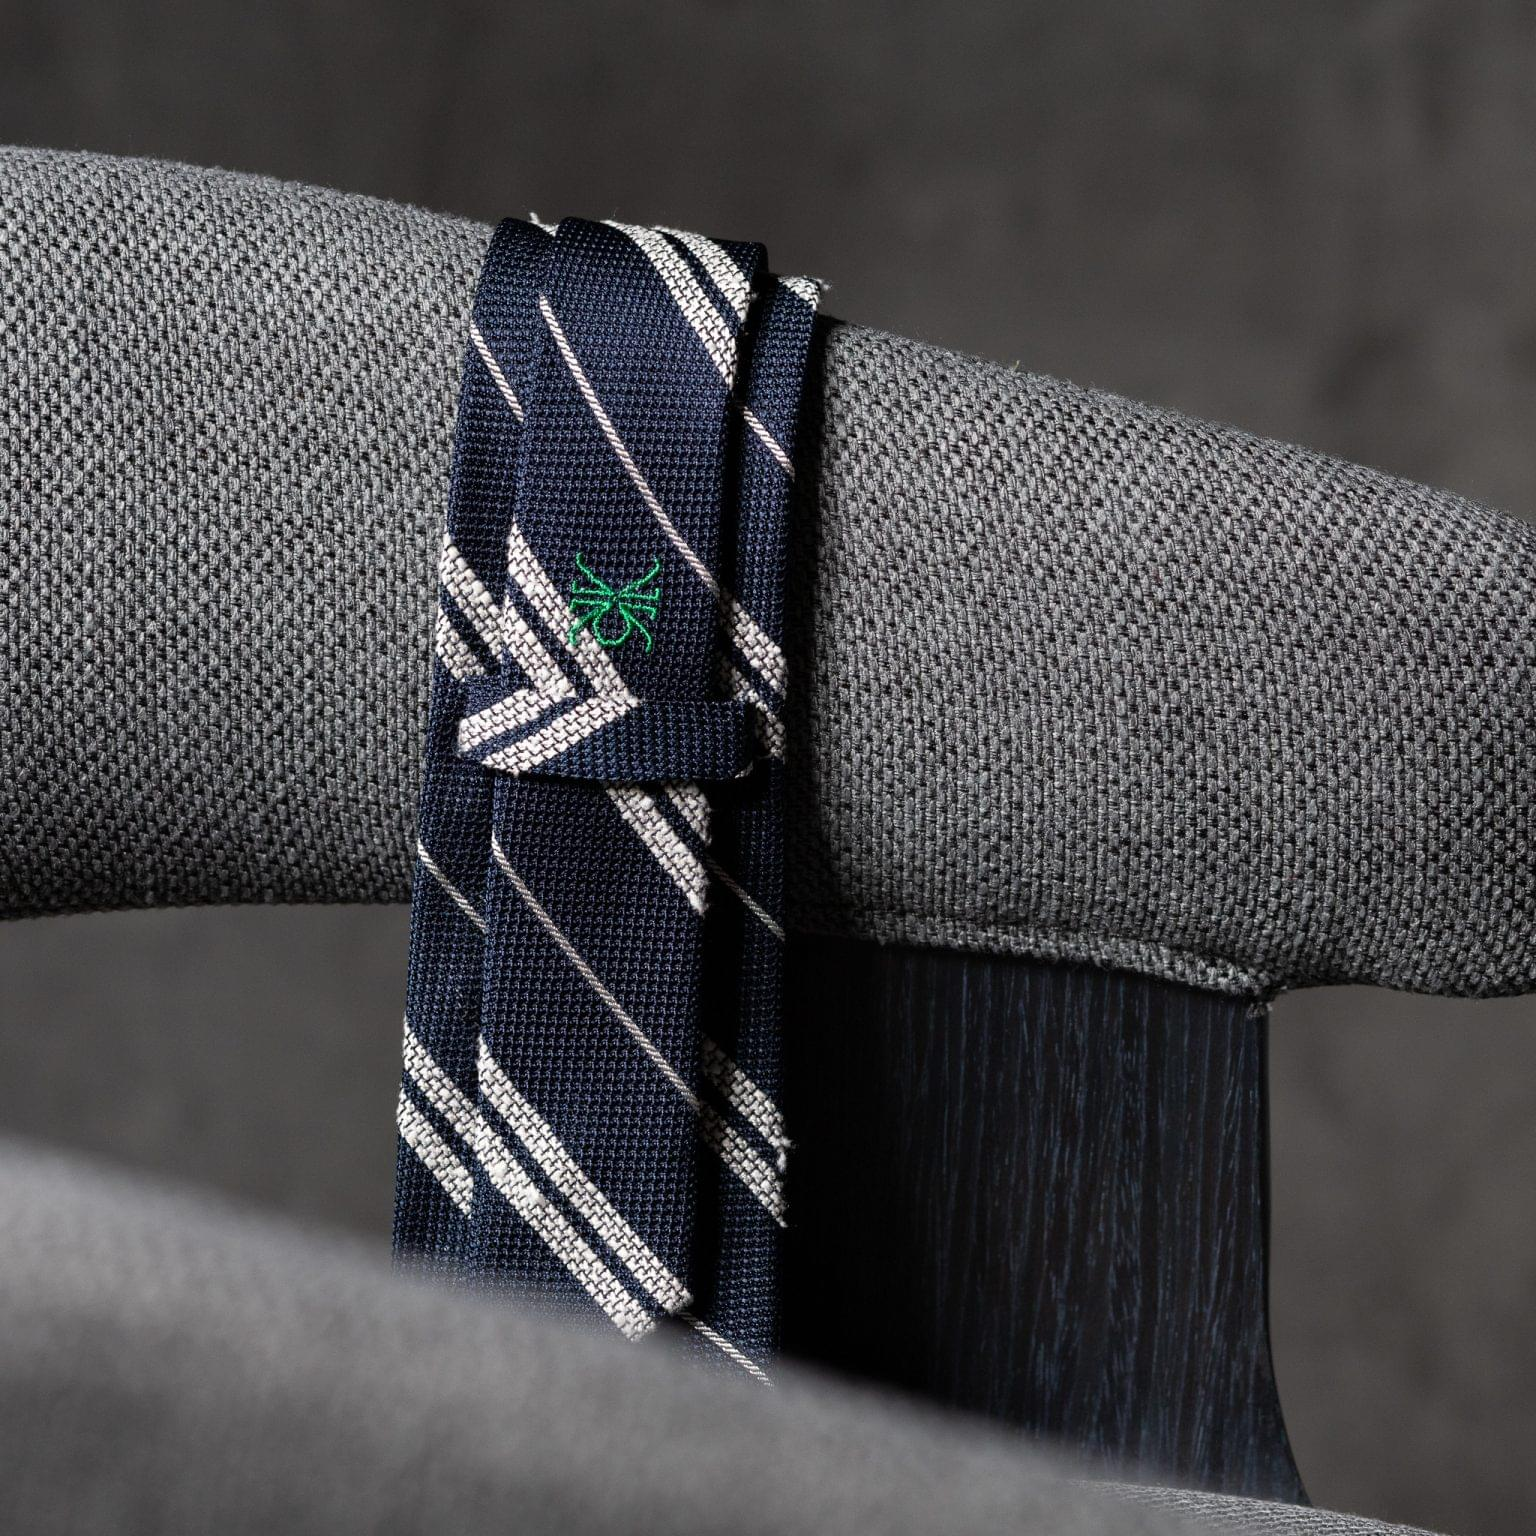 GRENADINE-0360-Tie-Initials-Corbata-Iniciales-The-Seelk-4